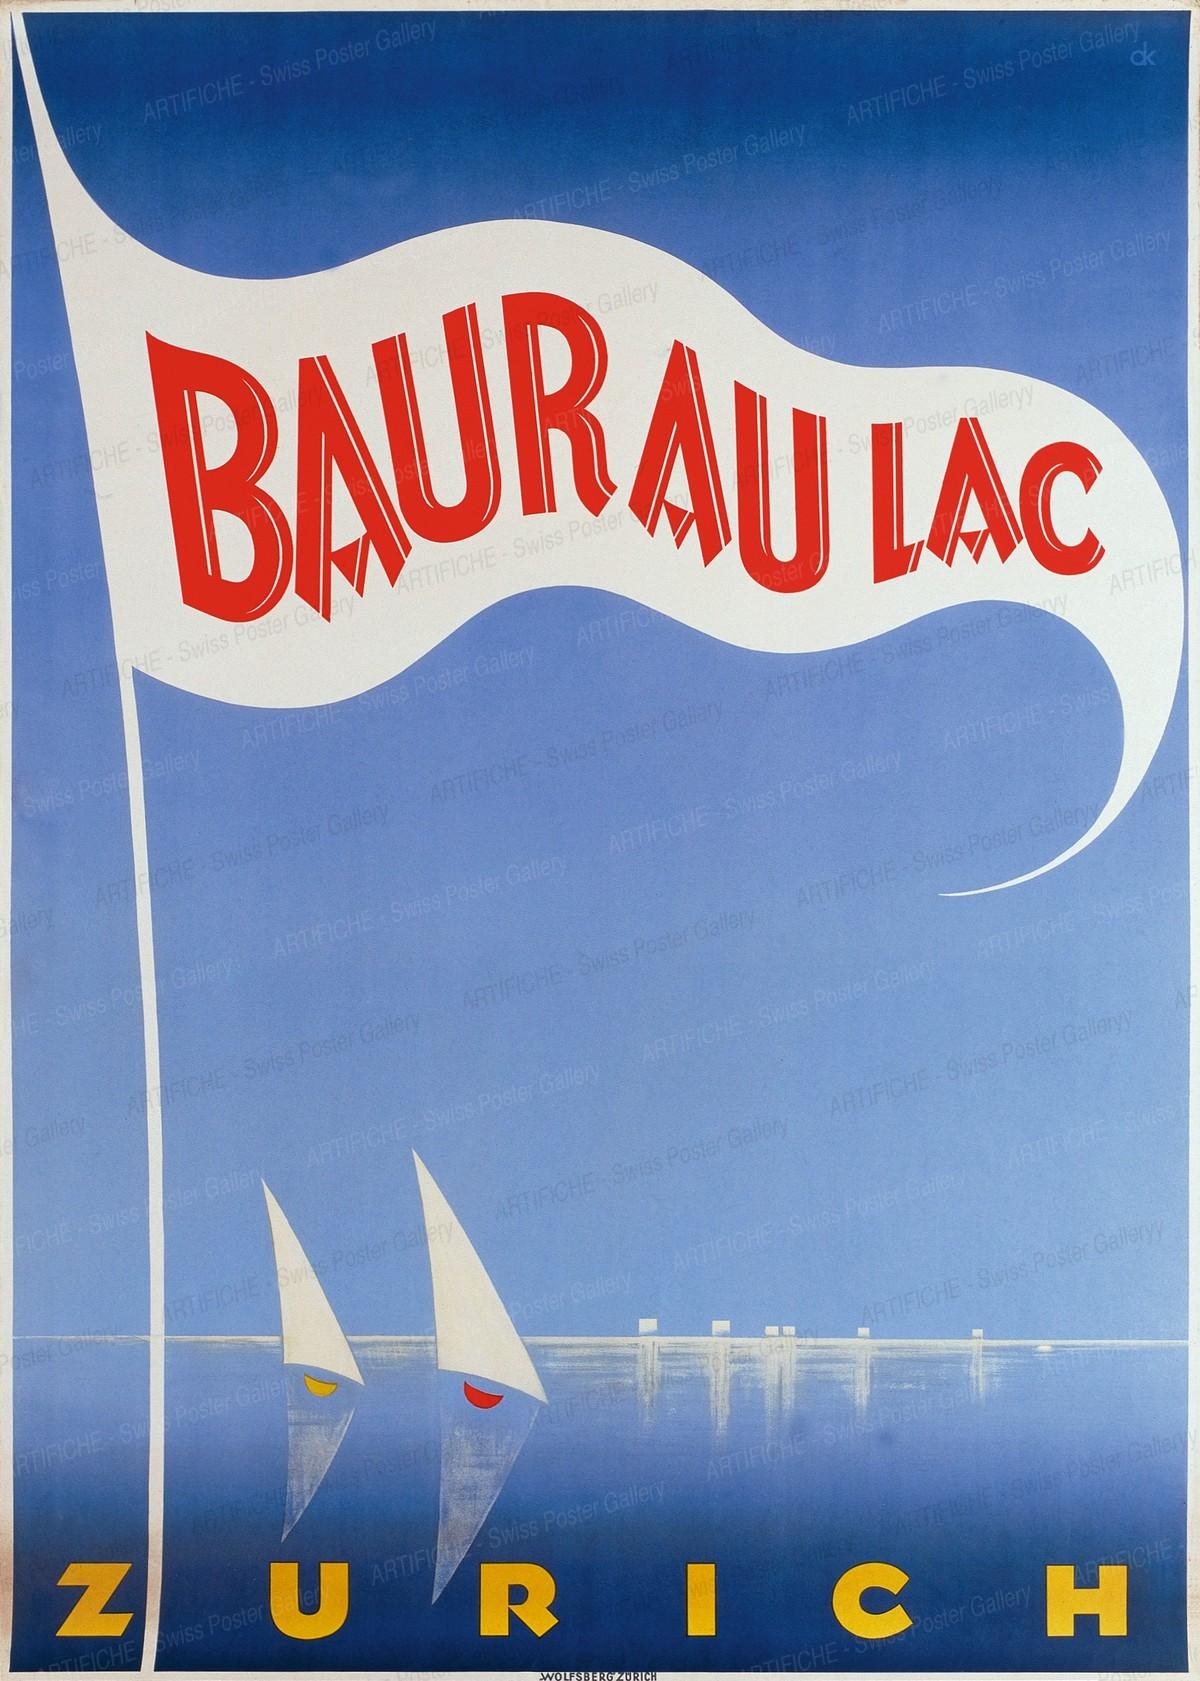 BAUR AU LAC ZURICH, Charles Kuhn